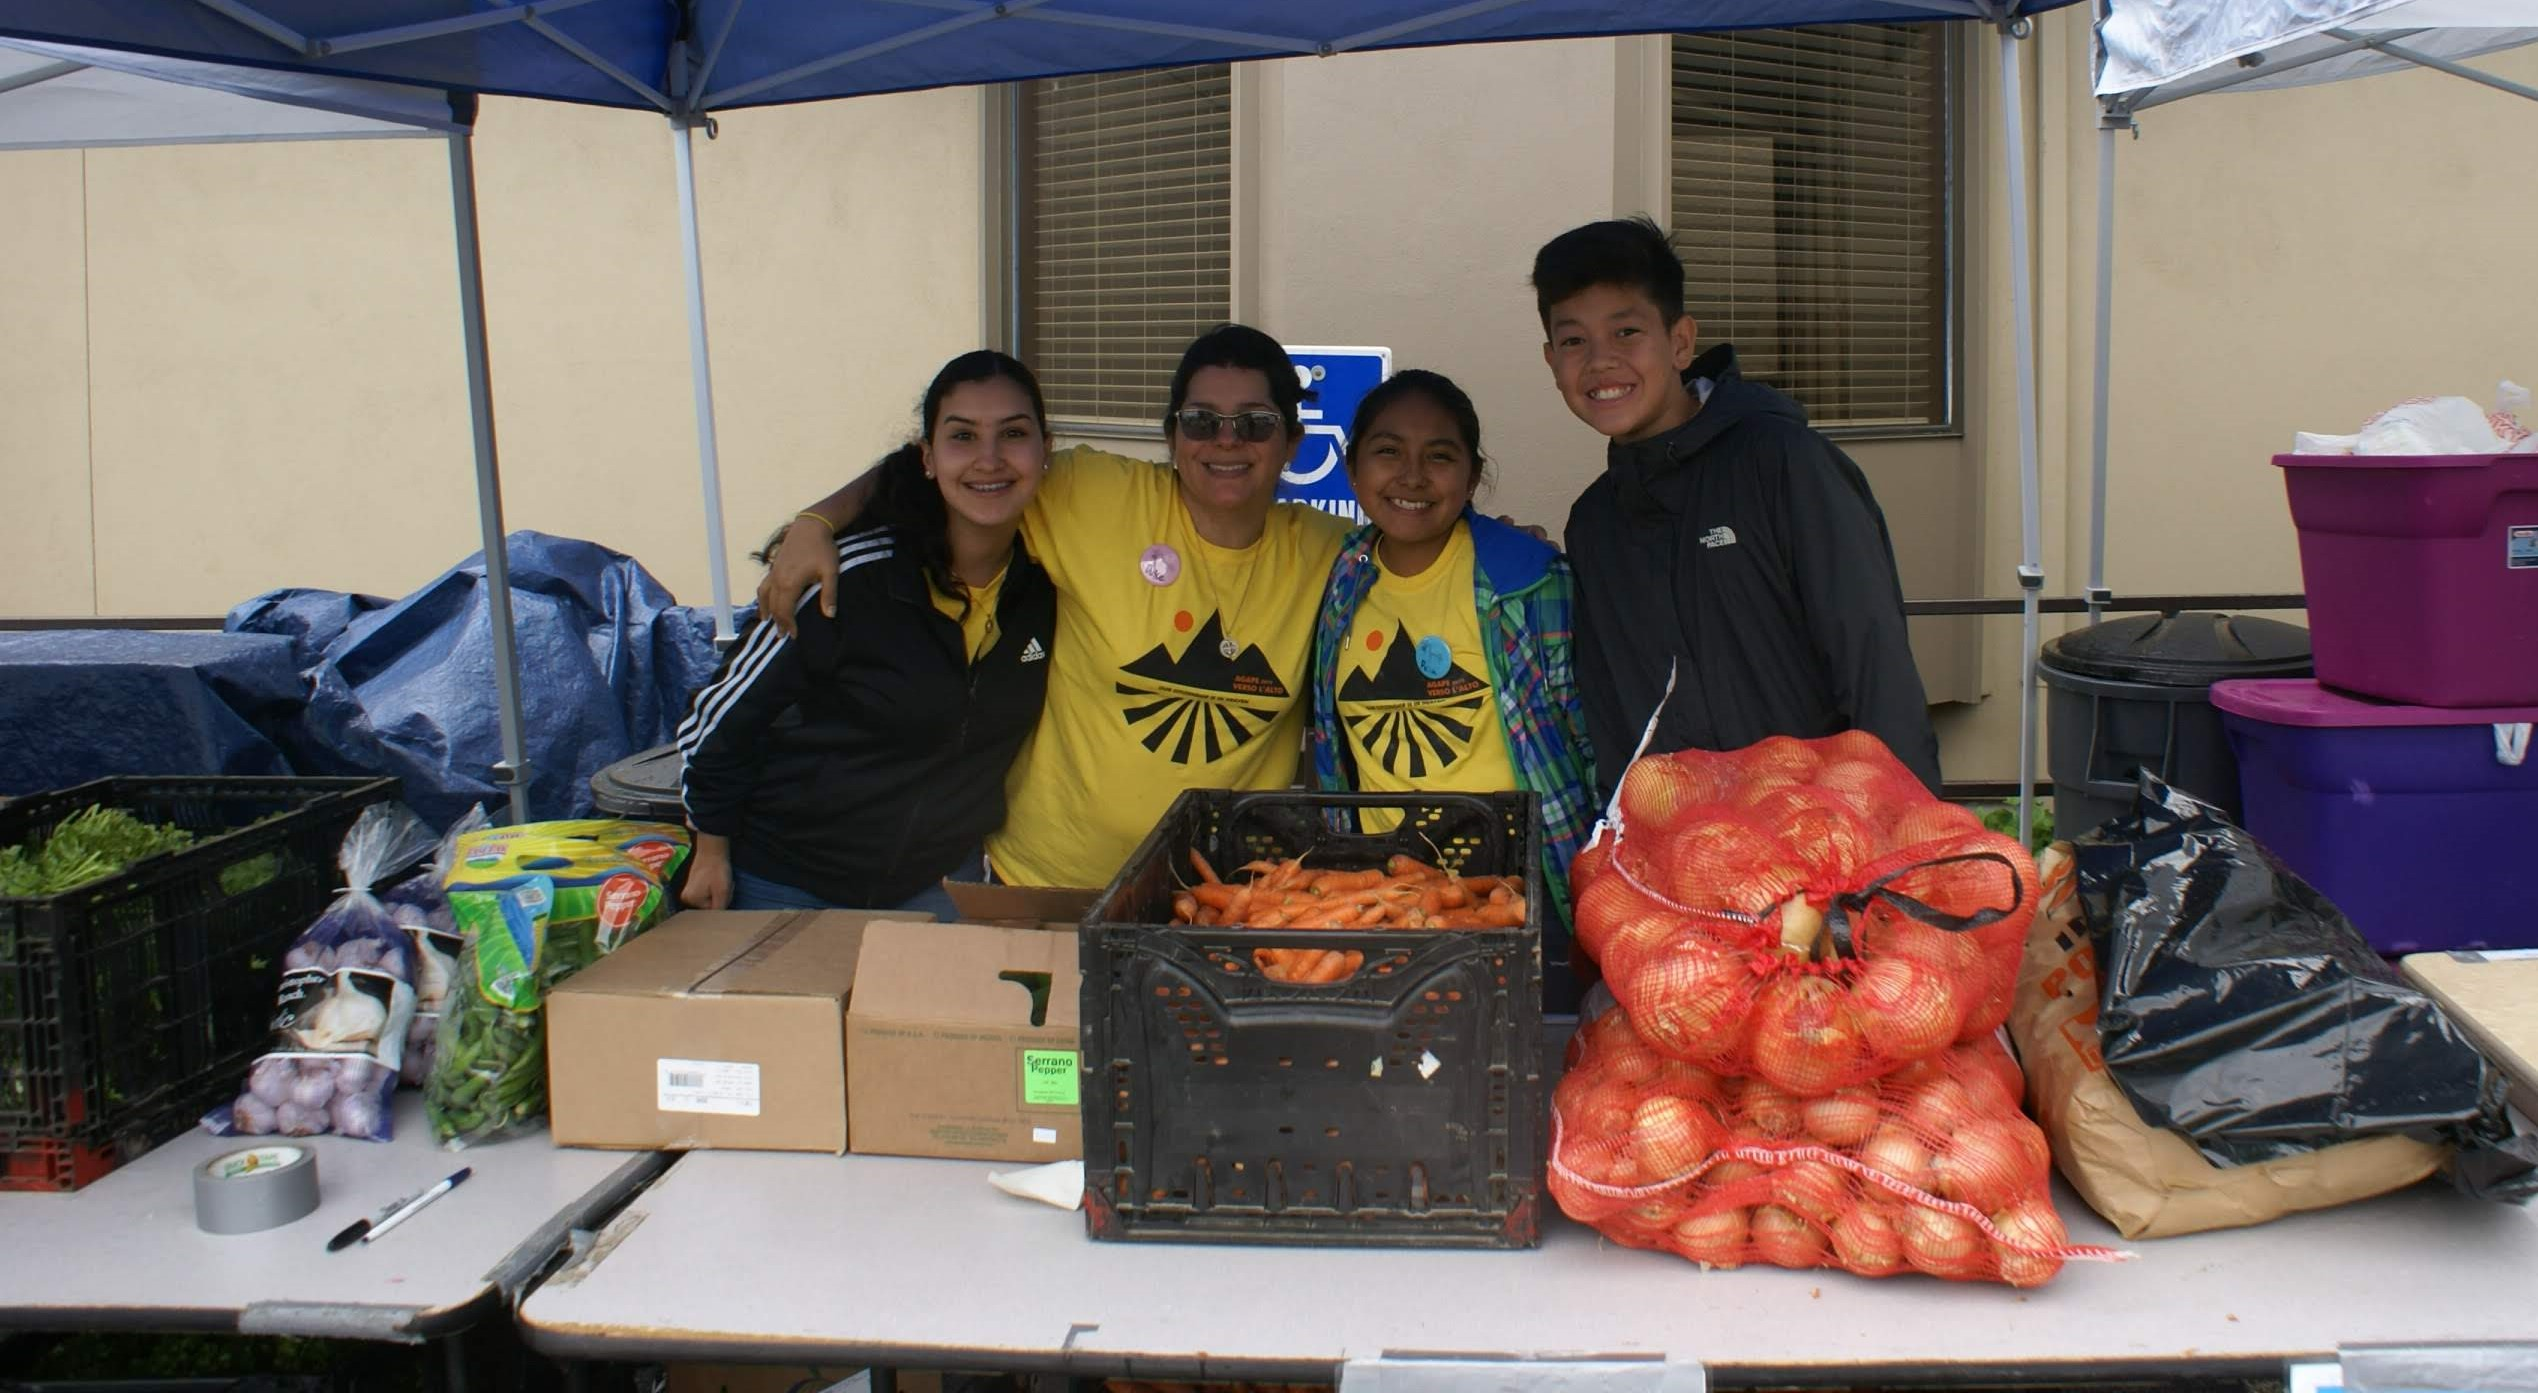 agape, food bank, youth, smiles, service, volunteer